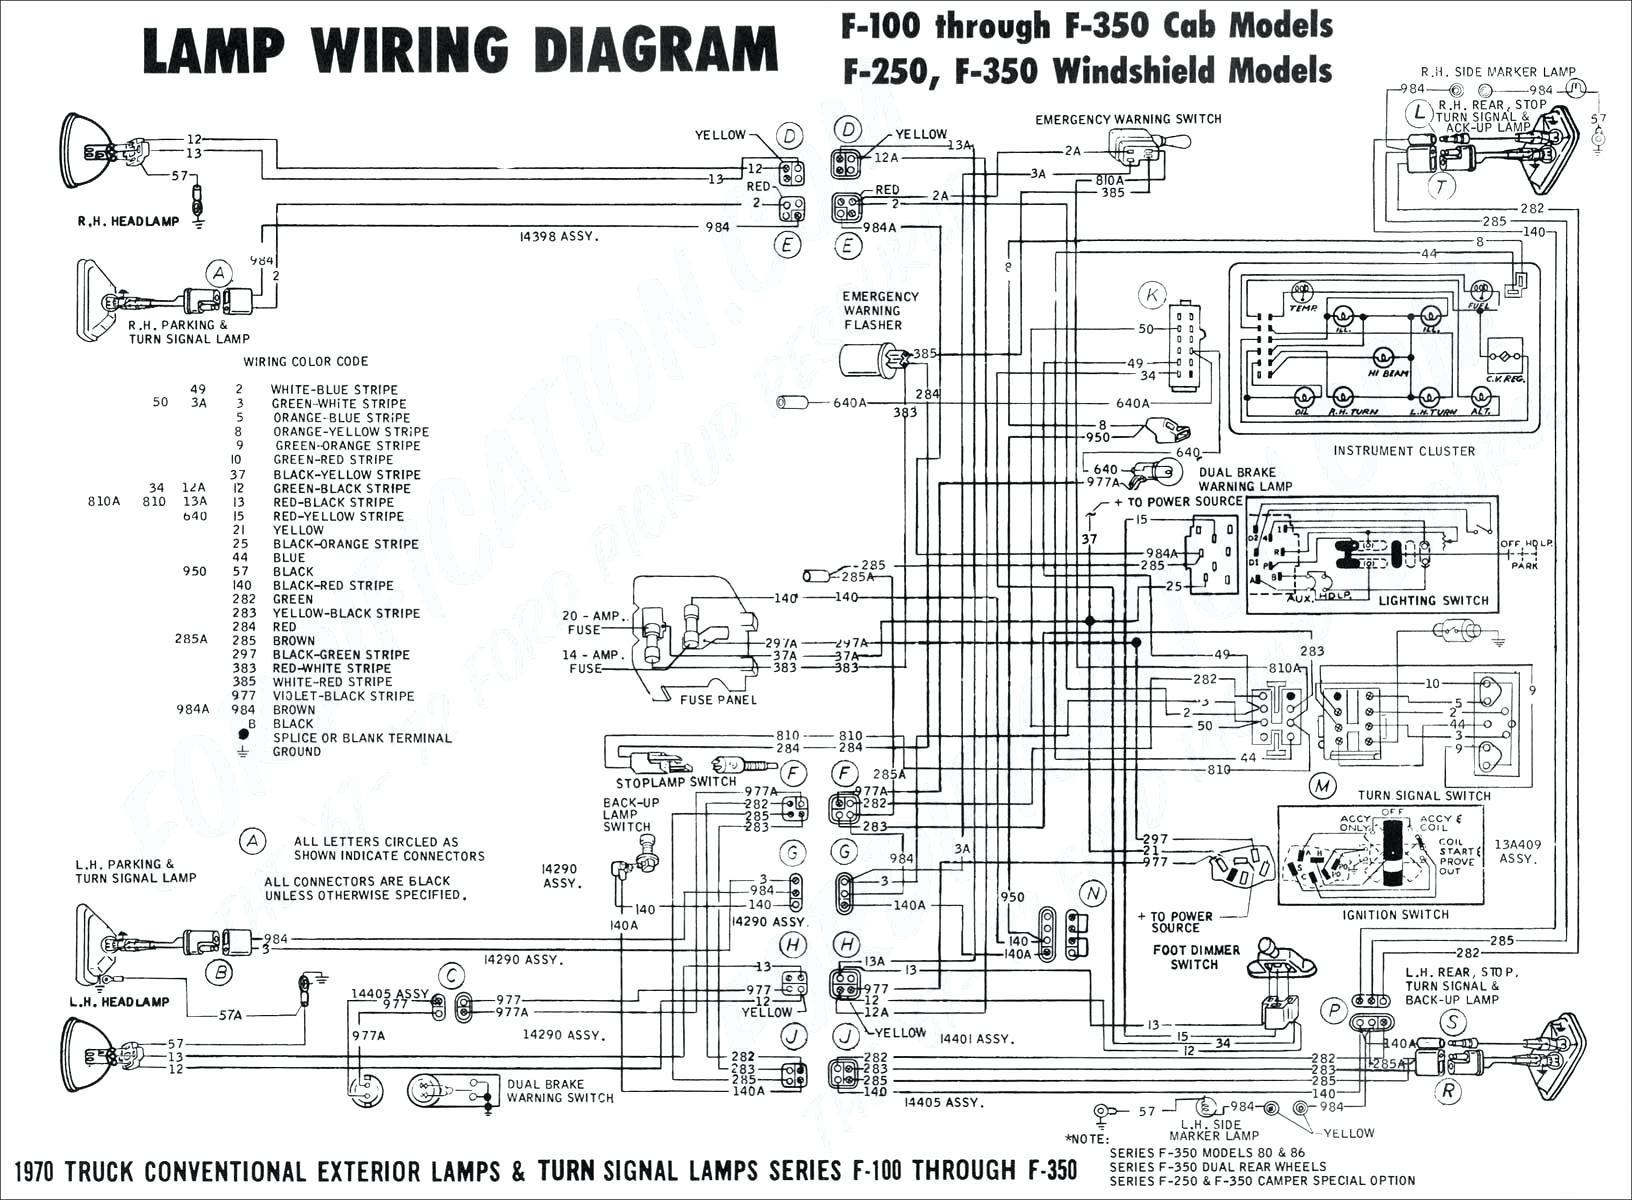 1994 Chevy Truck Brake Light Wiring Diagram Wiring